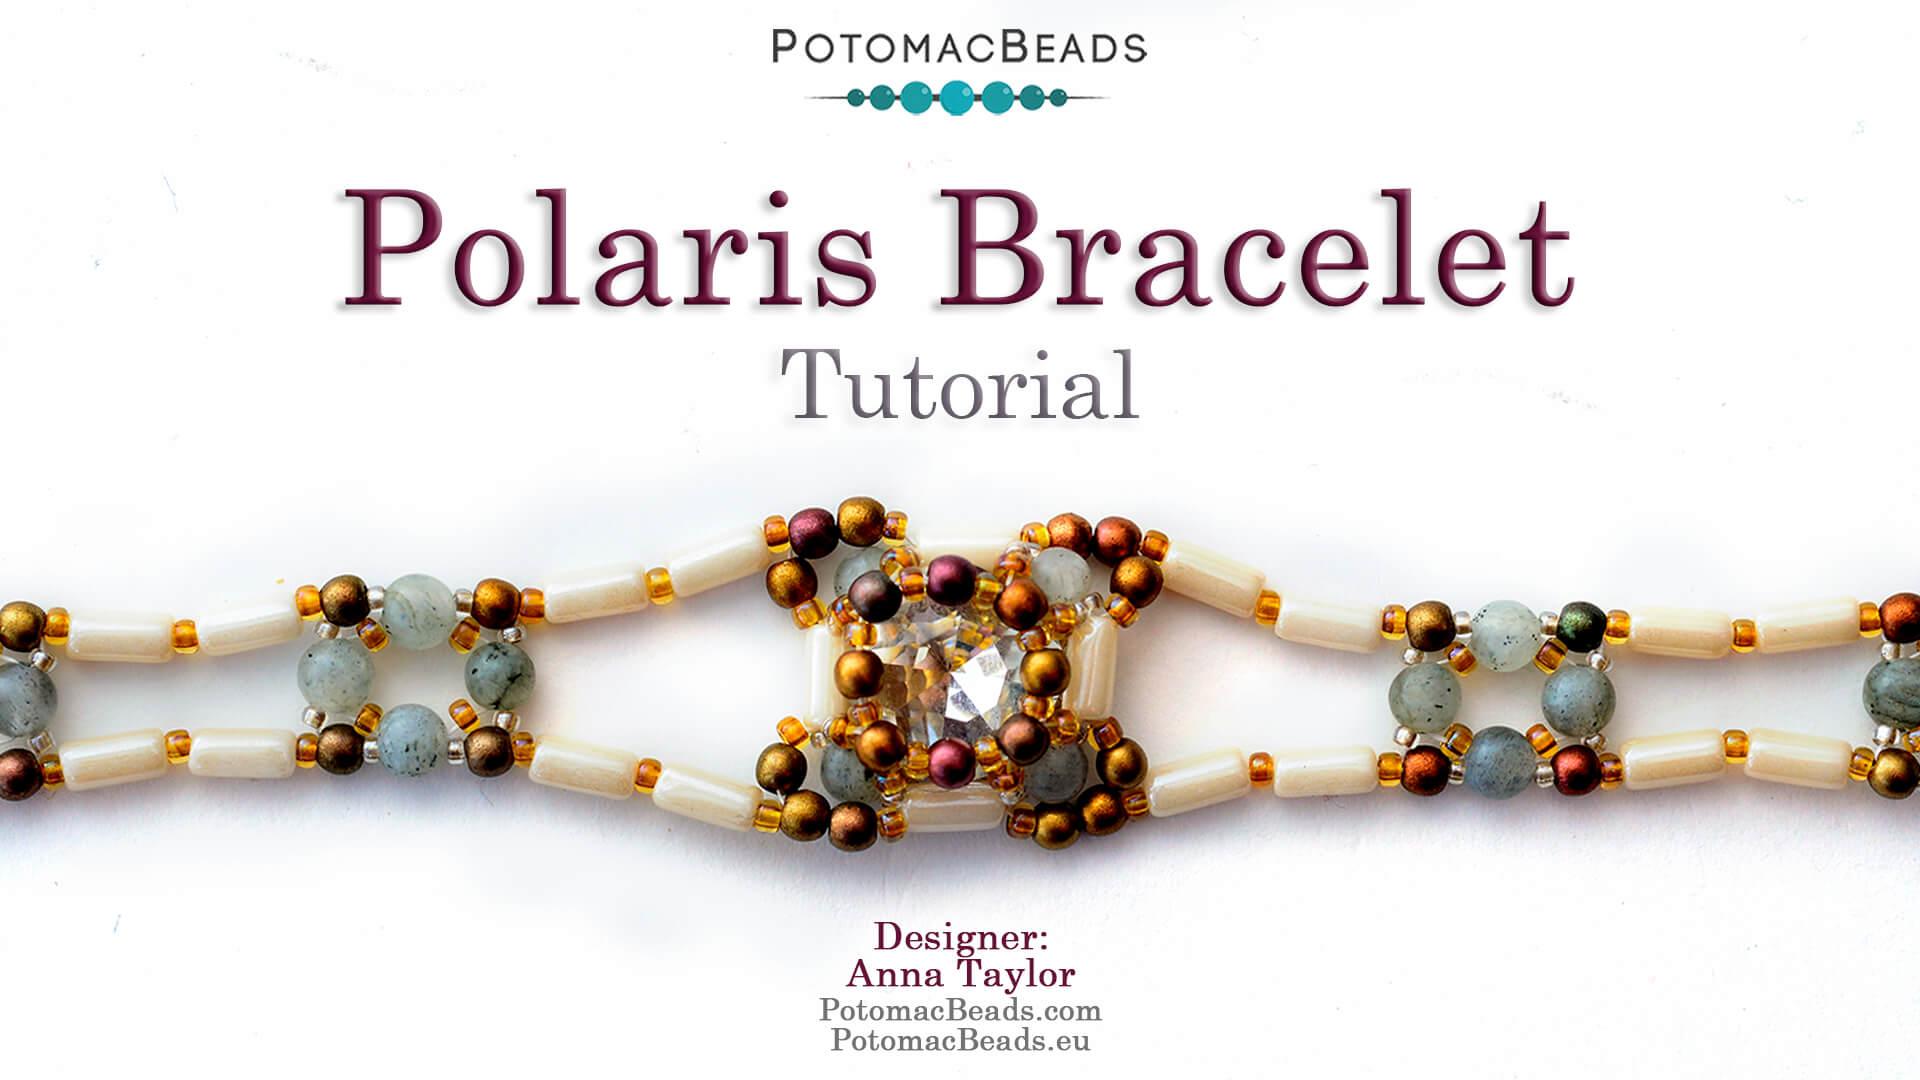 How to Bead / Videos Sorted by Beads / Tubelet Bead Videos / Polaris Bracelet Tutorial